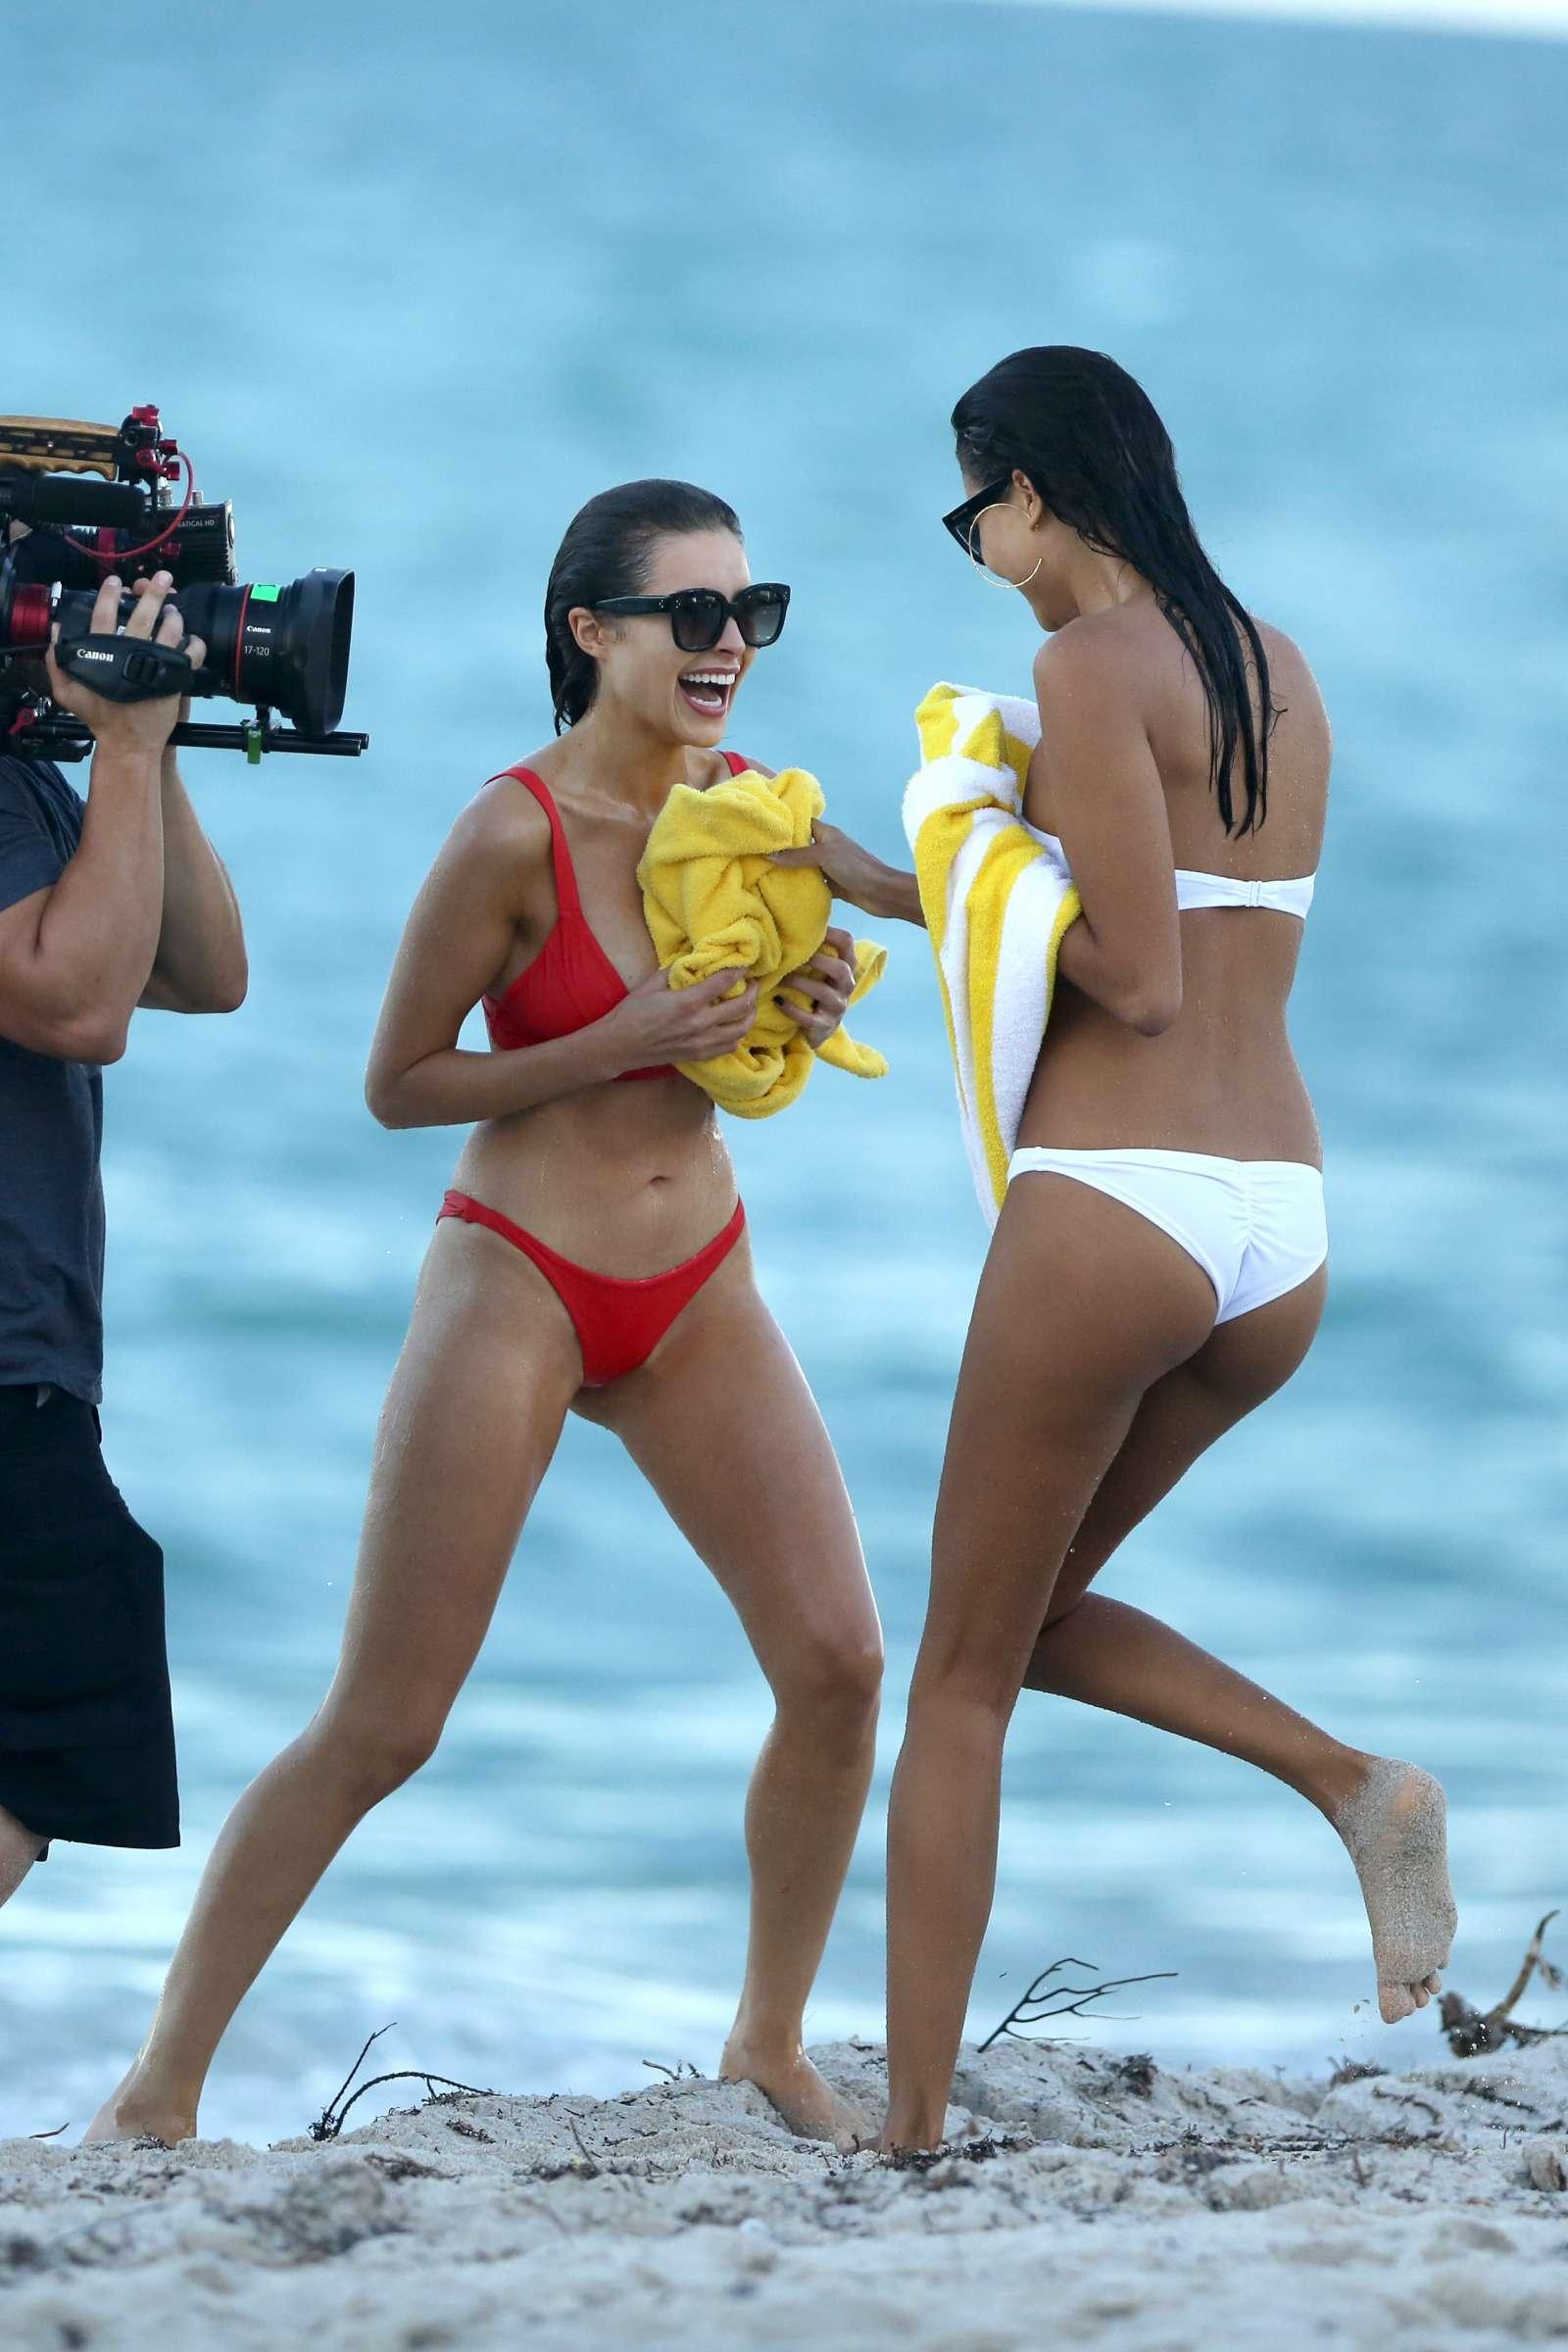 Bikini Daniela Braga nude (47 foto and video), Ass, Cleavage, Feet, swimsuit 2019